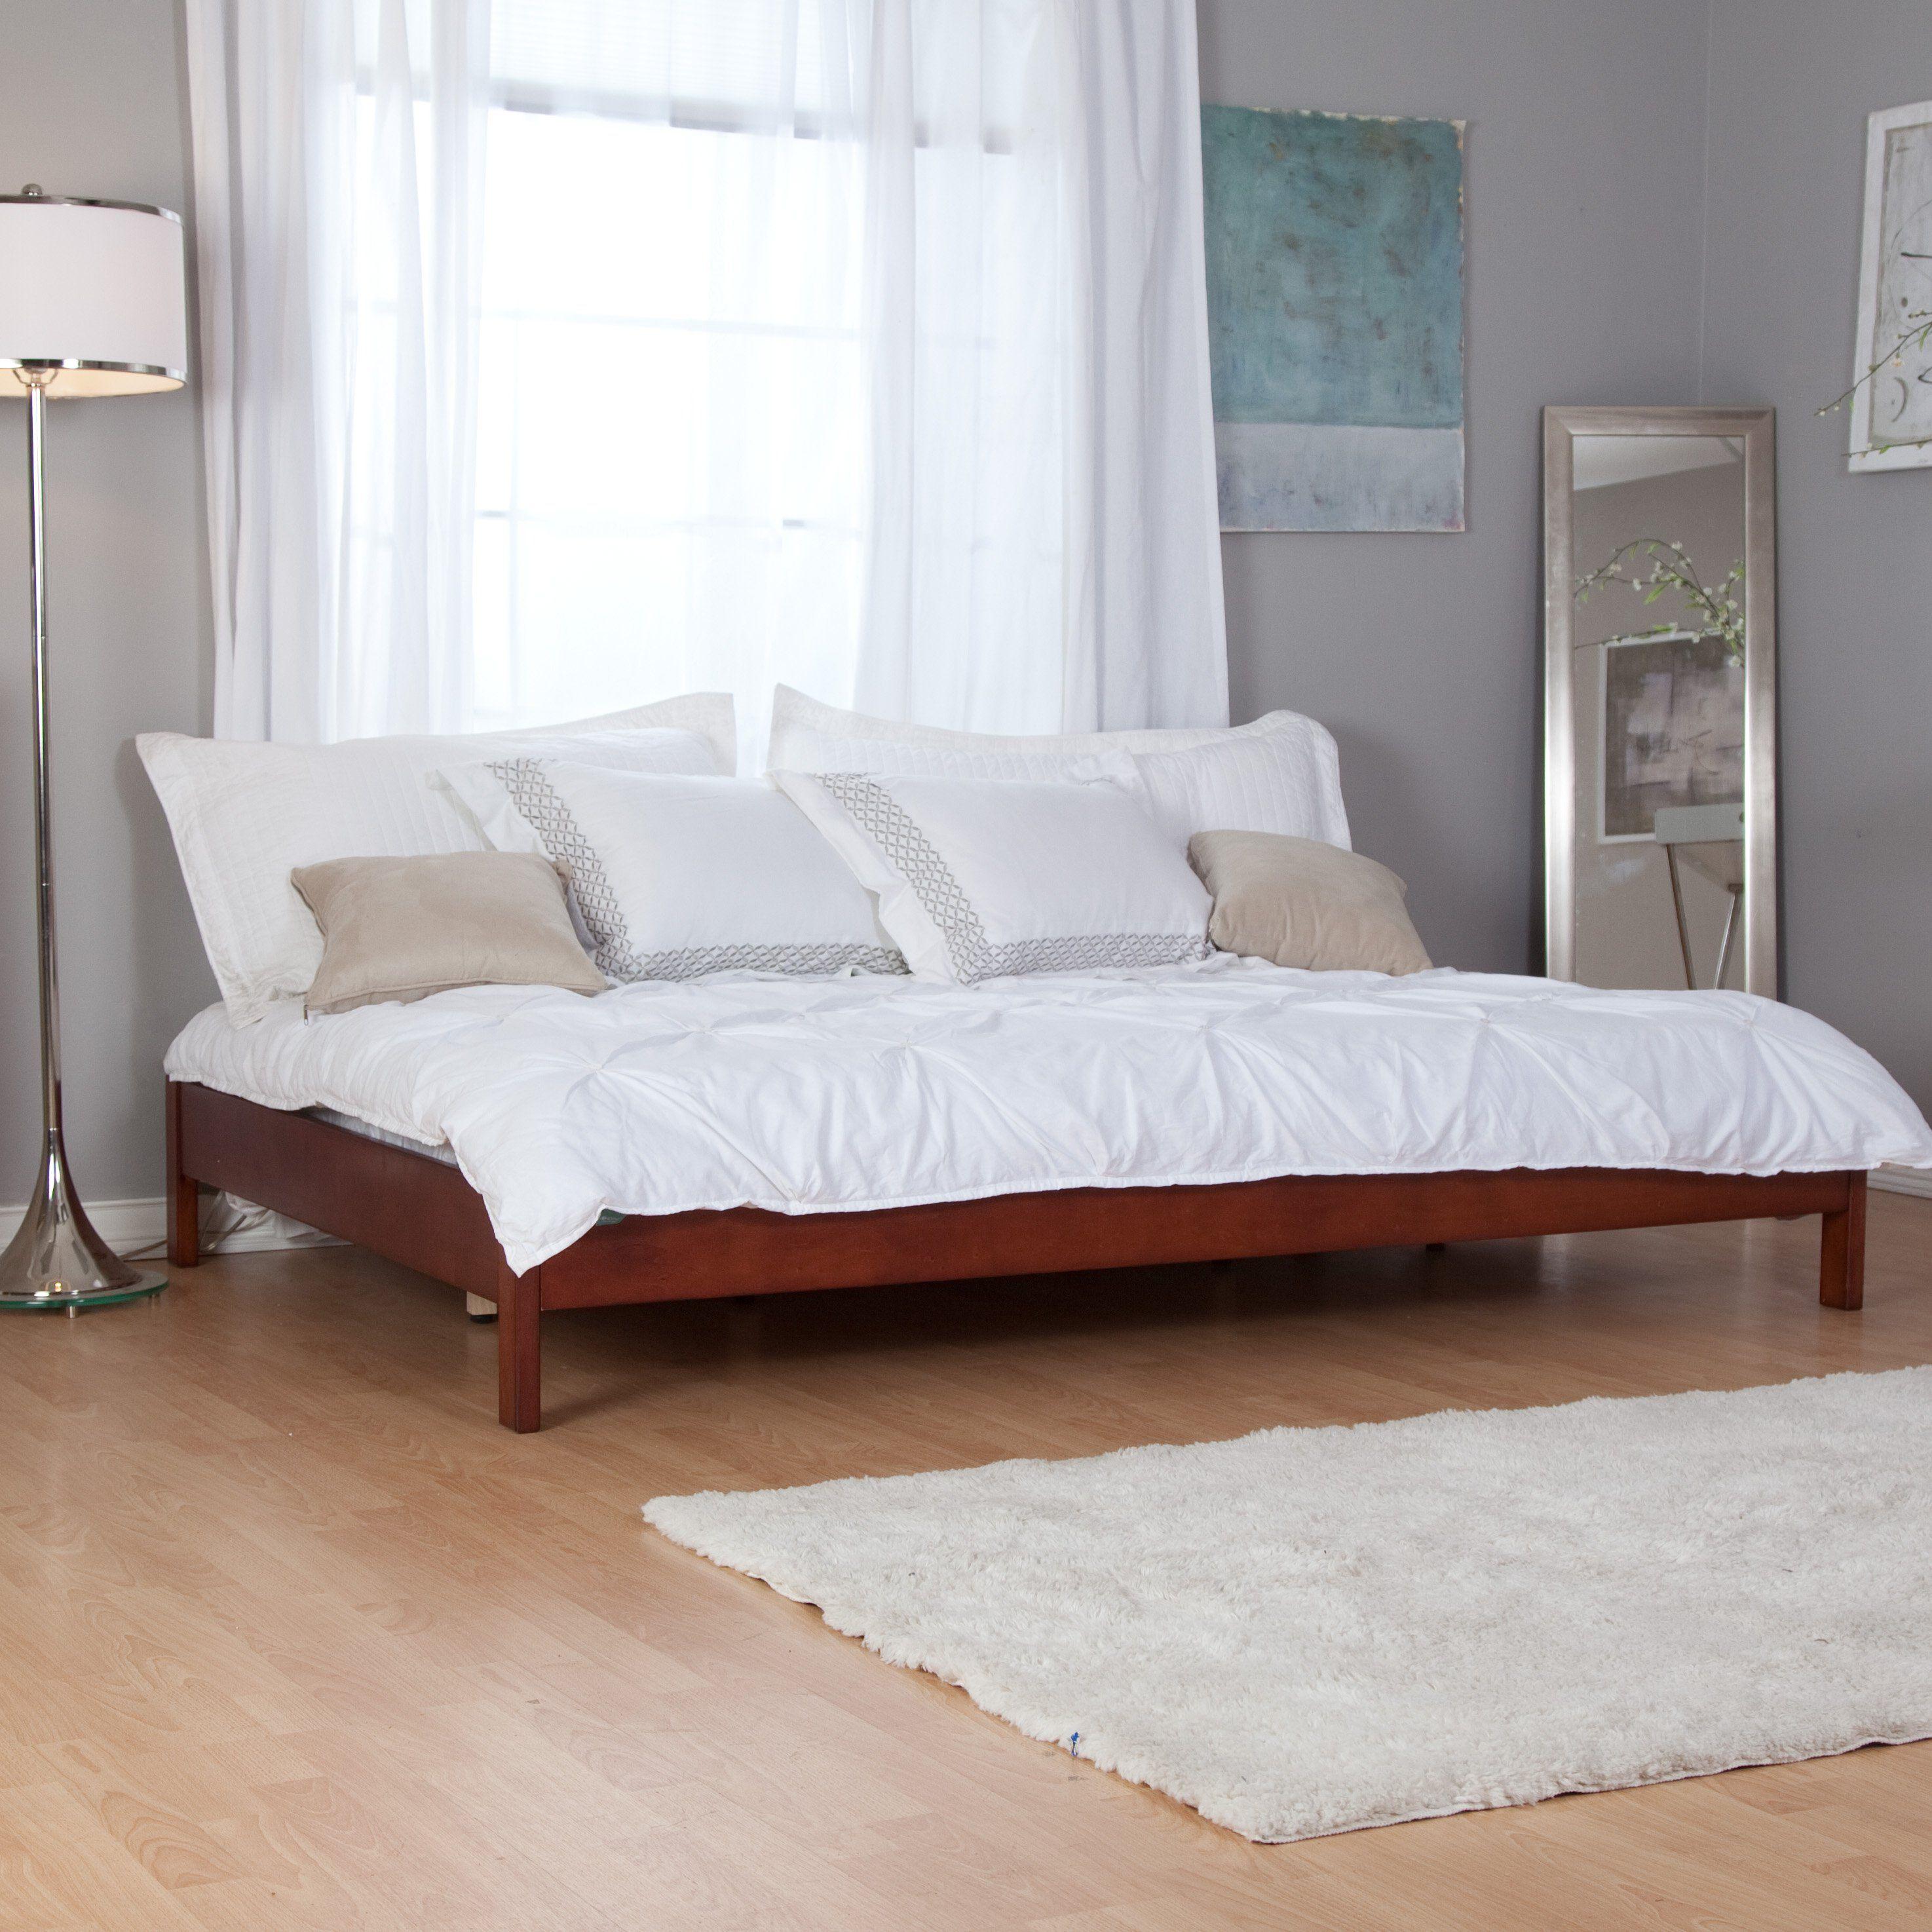 Fashion Bed Group Murrayplatform Bed Las Vegas Furniture Online